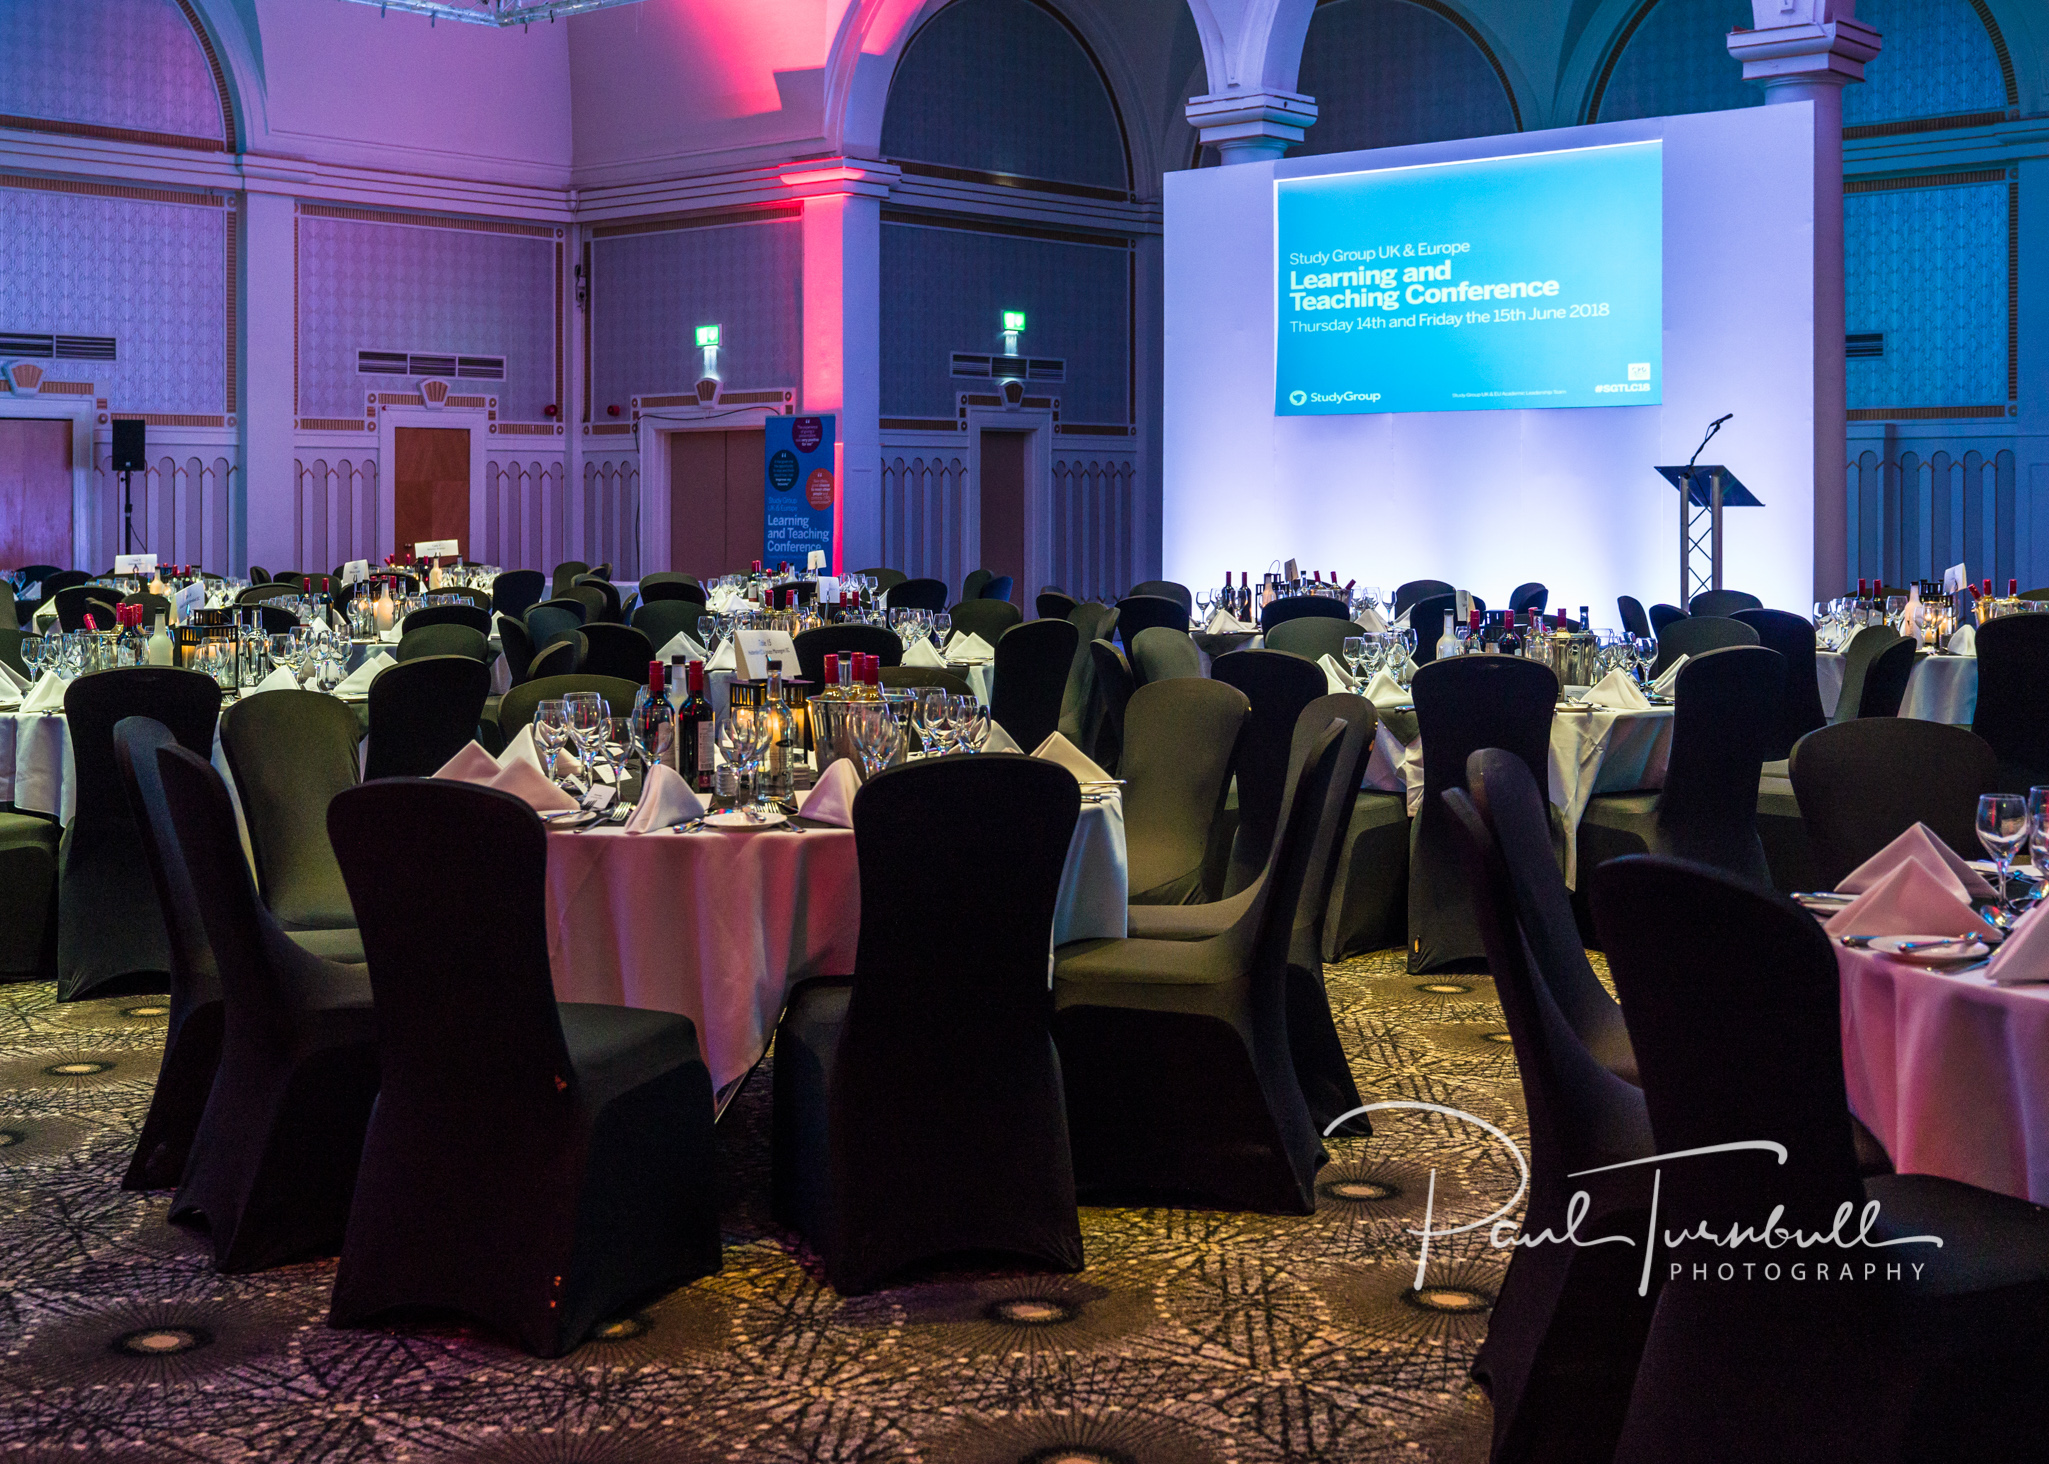 conference-event-photographer-queens-hotel-leeds-yorkshire-004.jpg